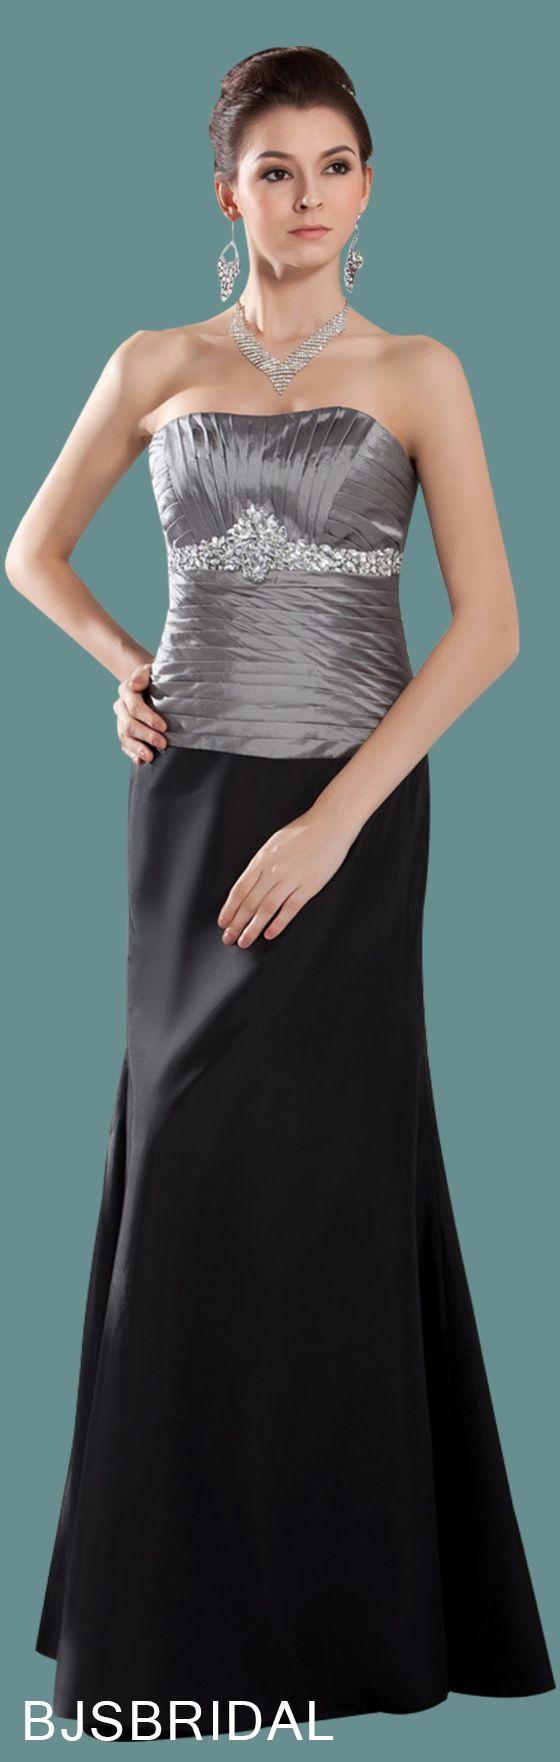 346 best Abendkleider images on Pinterest | Ball gowns, Birthday ...